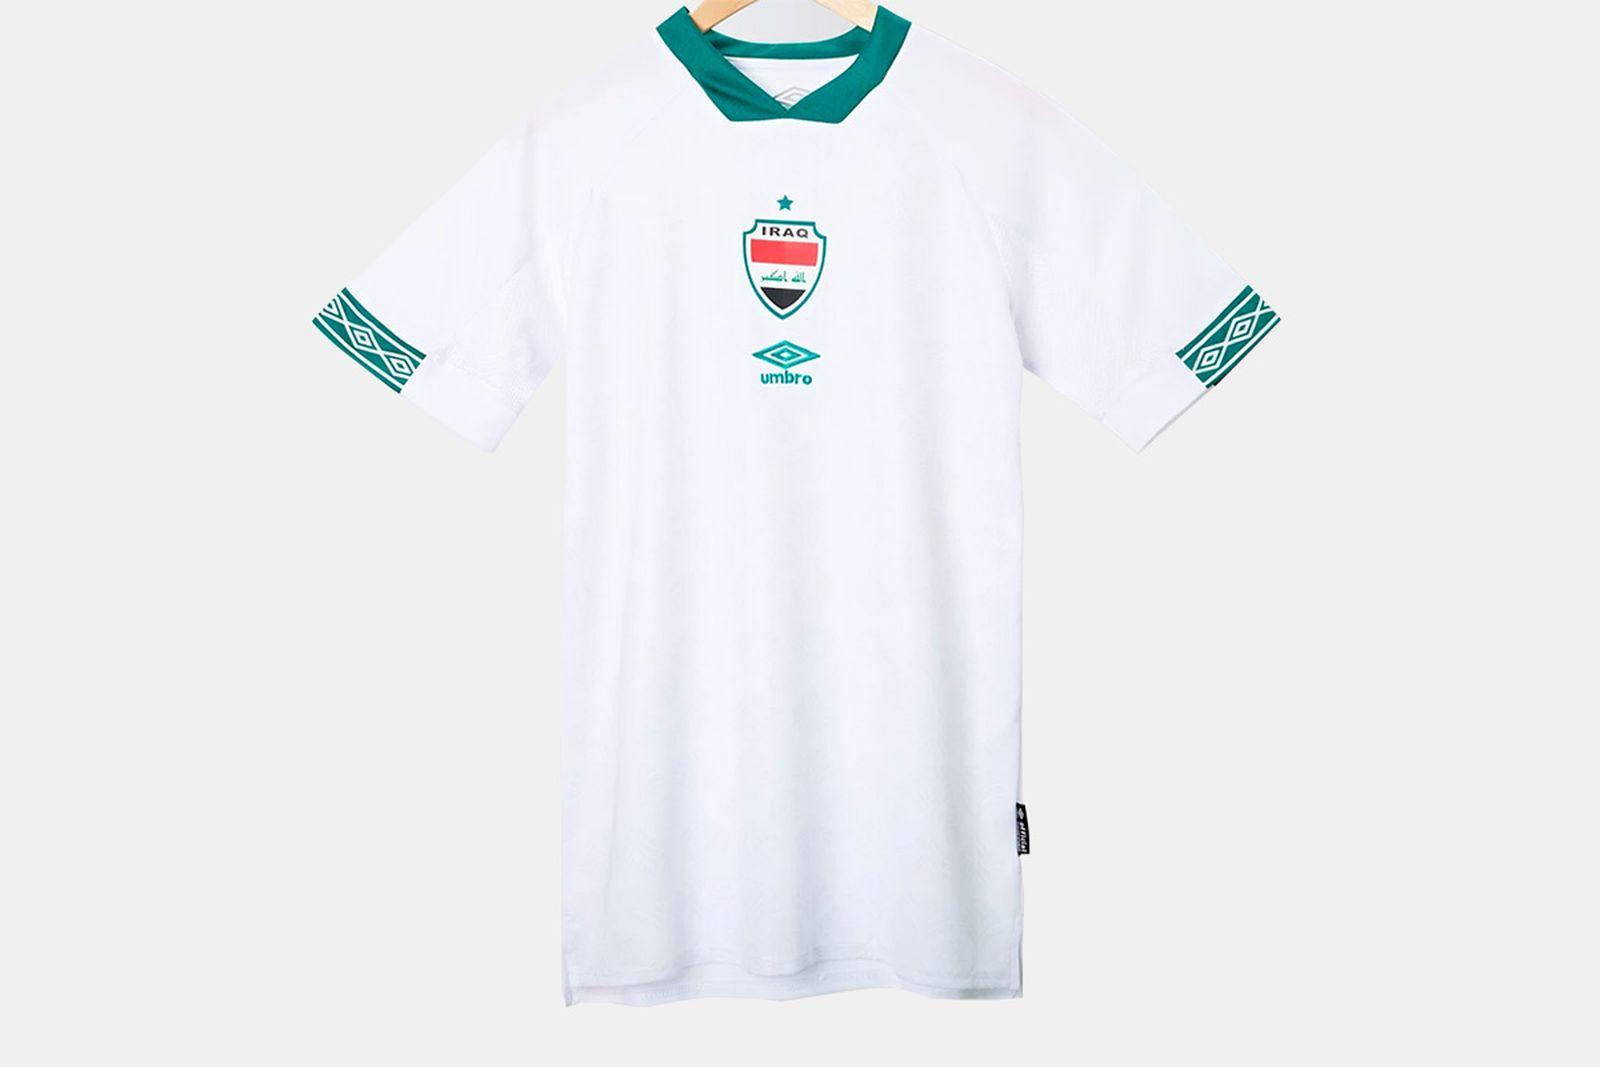 umbro-iraq-2021-home-away-jersey-04